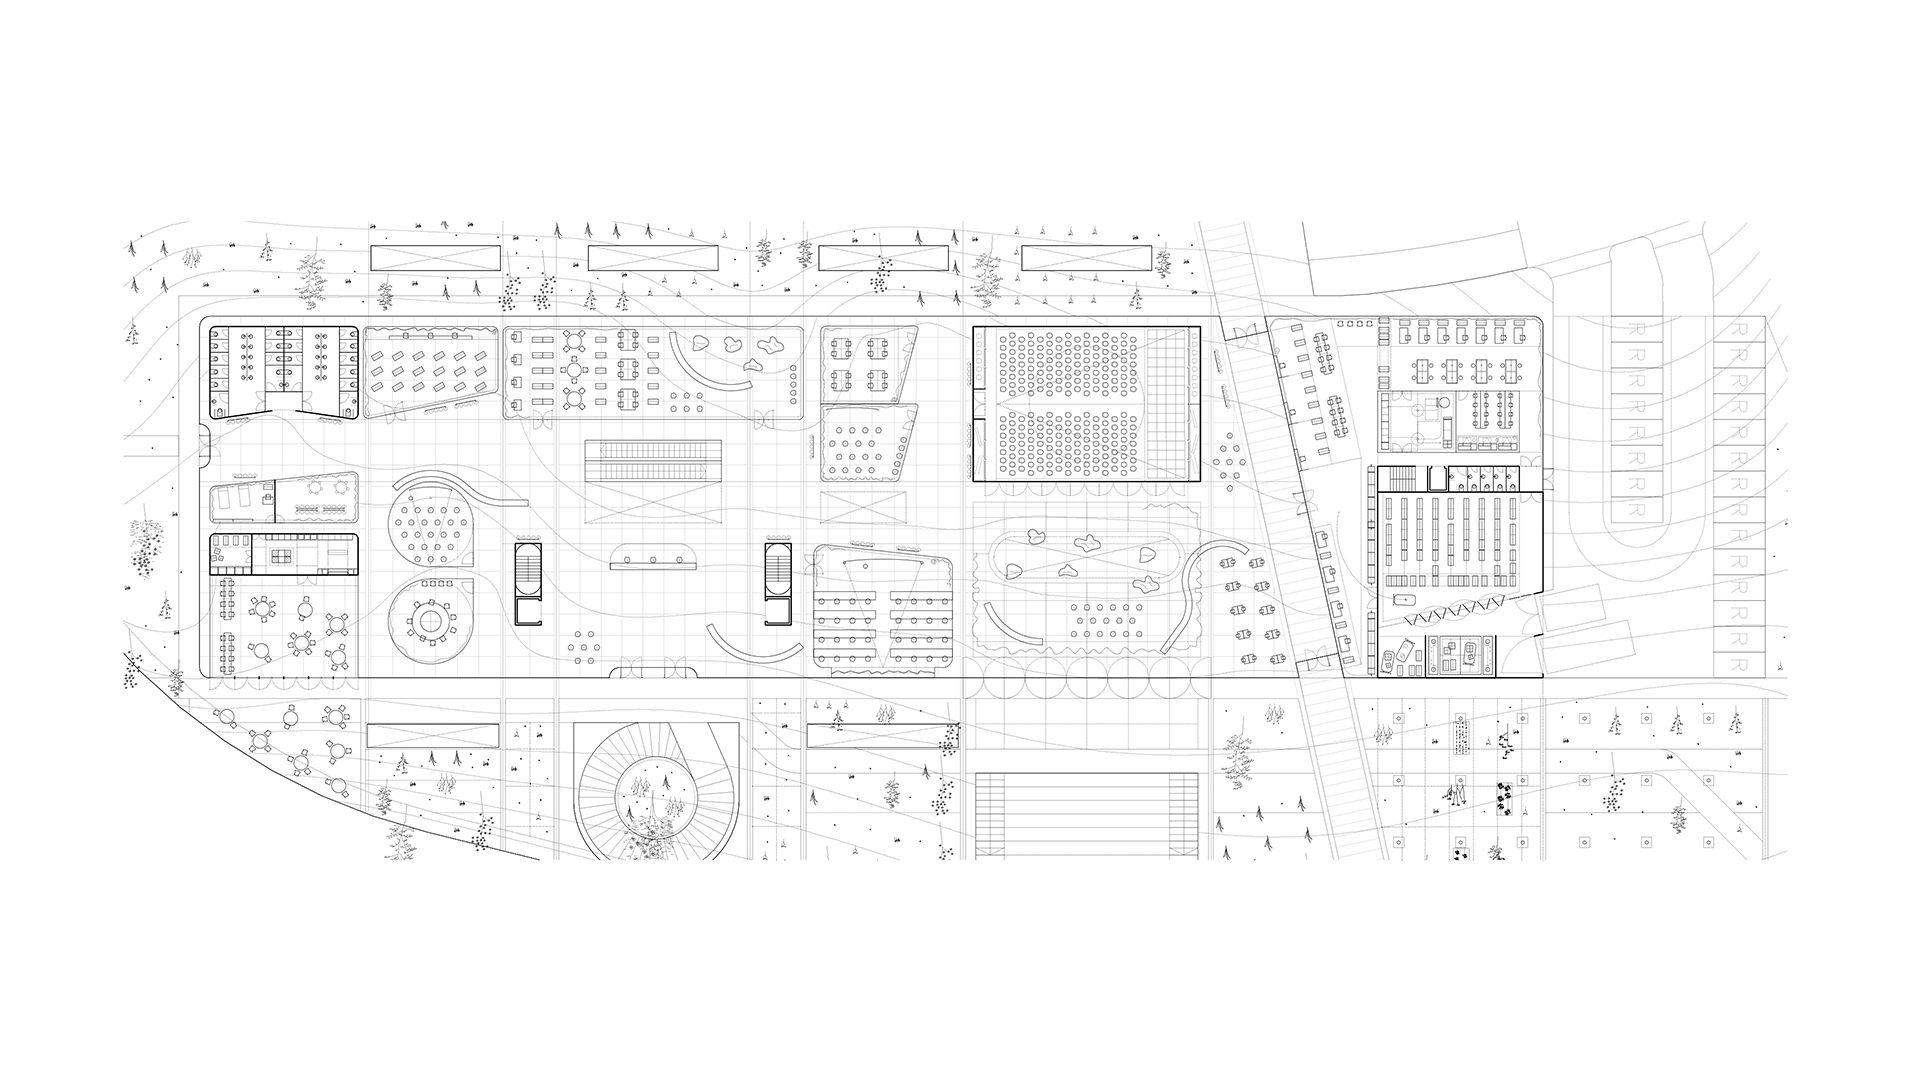 NMKL_Ground Floor Plan